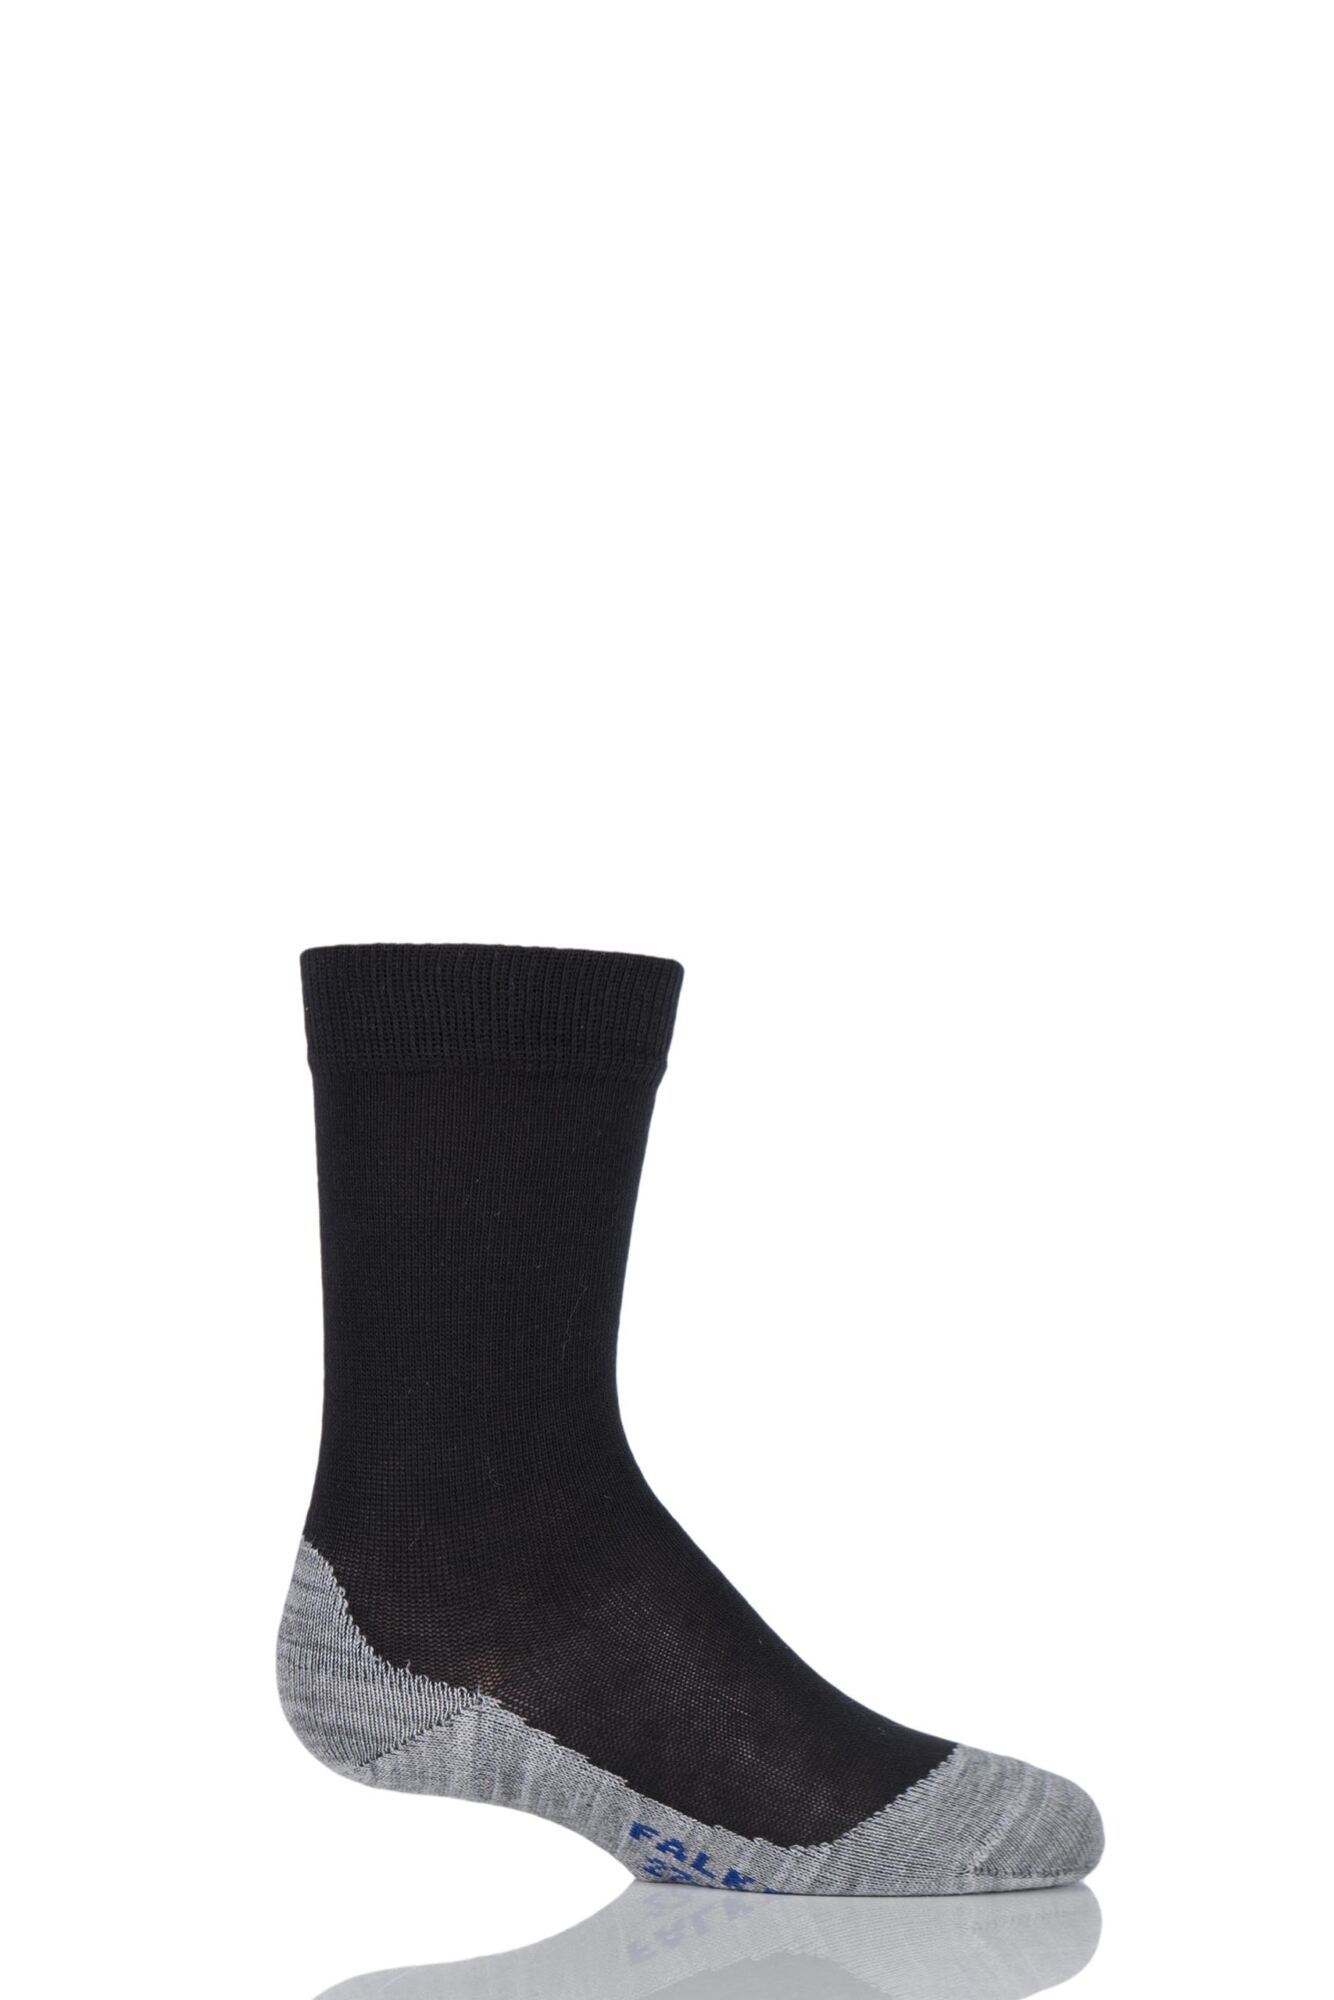 1 Pair Active Sunny Days Cotton Sports Socks Kids Unisex - Falke